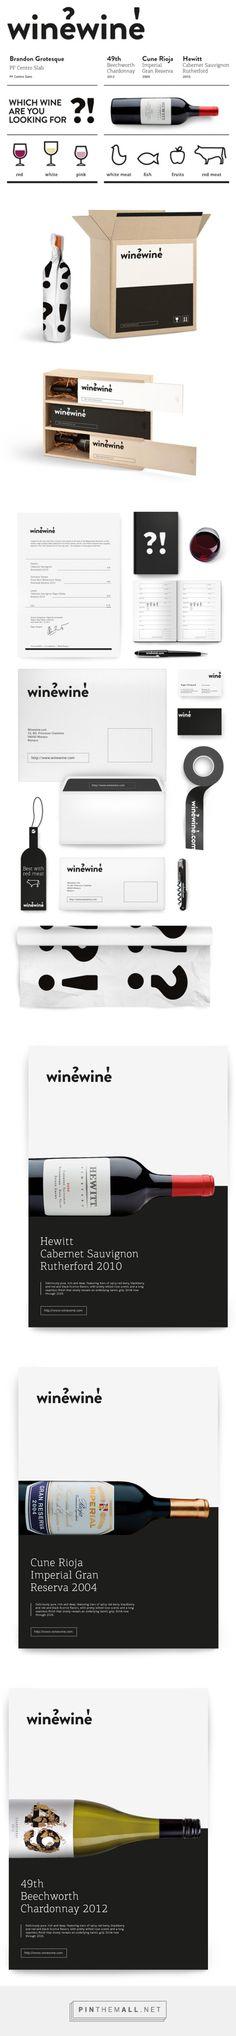 winewine Art direction: Marcin Wolny  Design: Julek Wierzchowski, Tomek Jurecki curated by Packaging Diva PD. What a fun packaging branding concept.